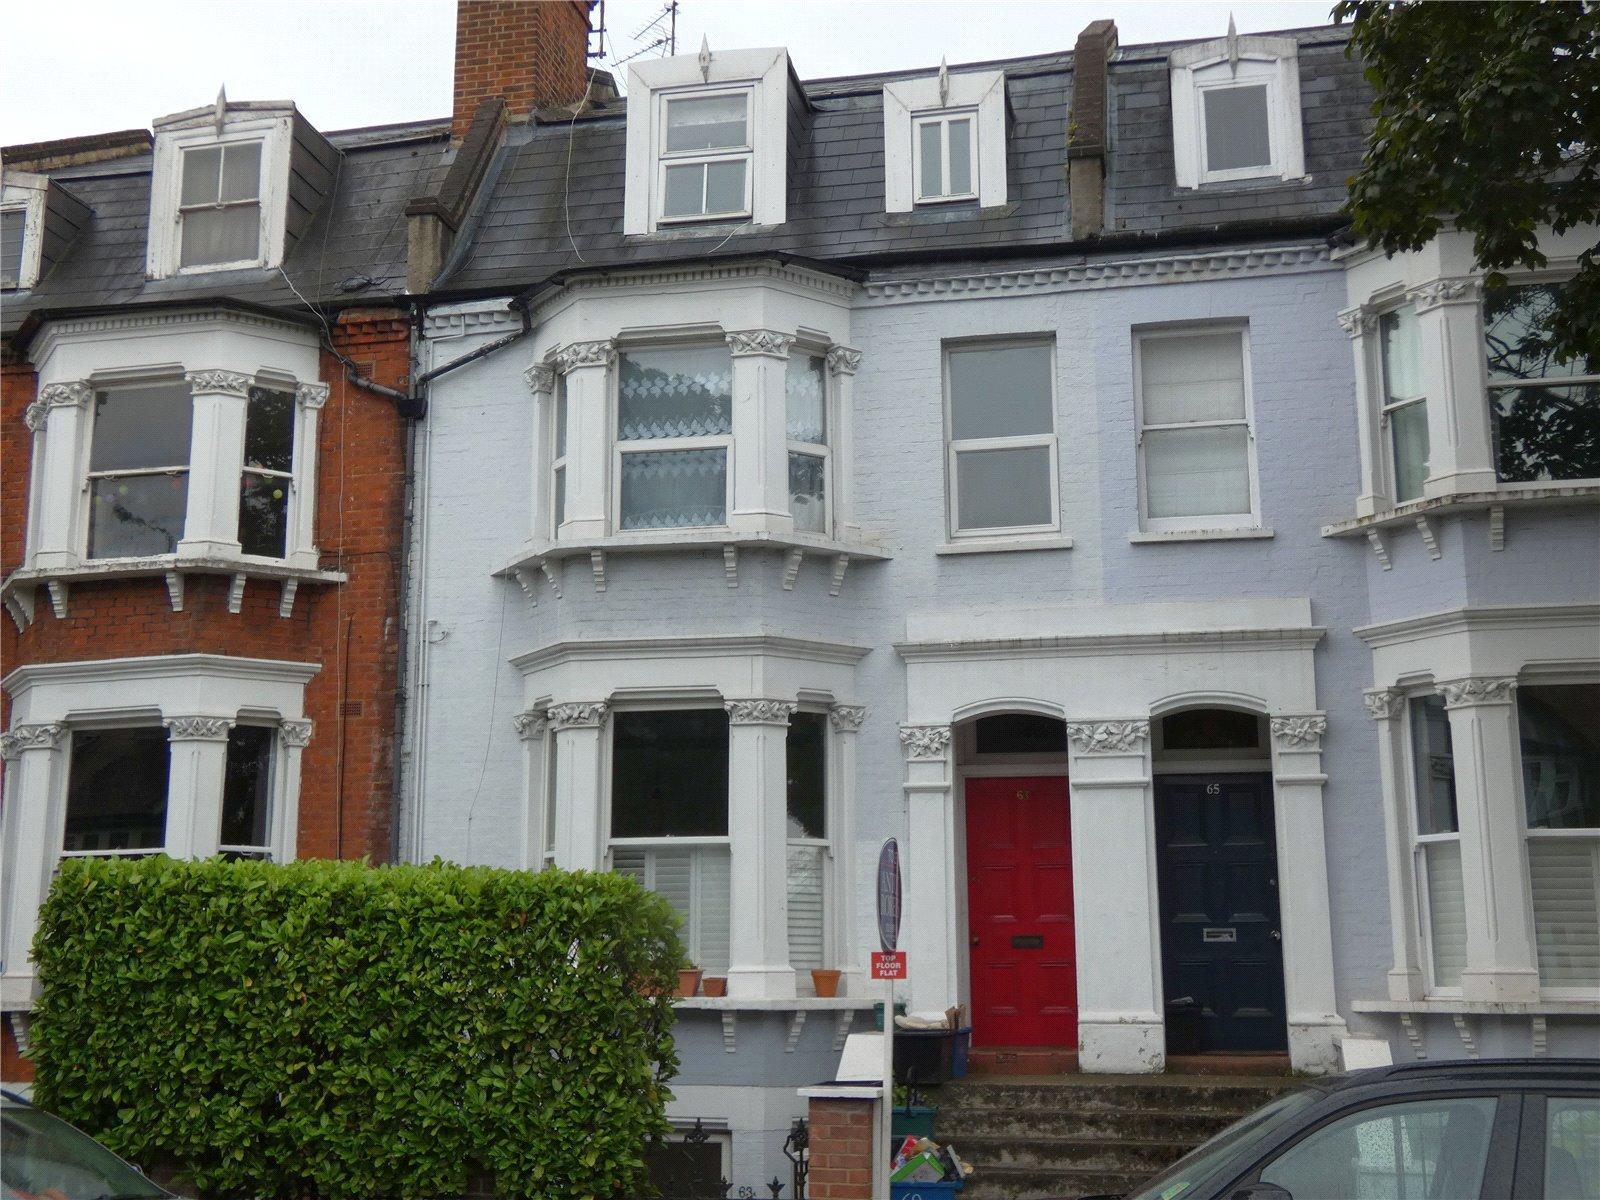 St. Margarets Road, Twickenham, TW1 2LL - Antony Roberts